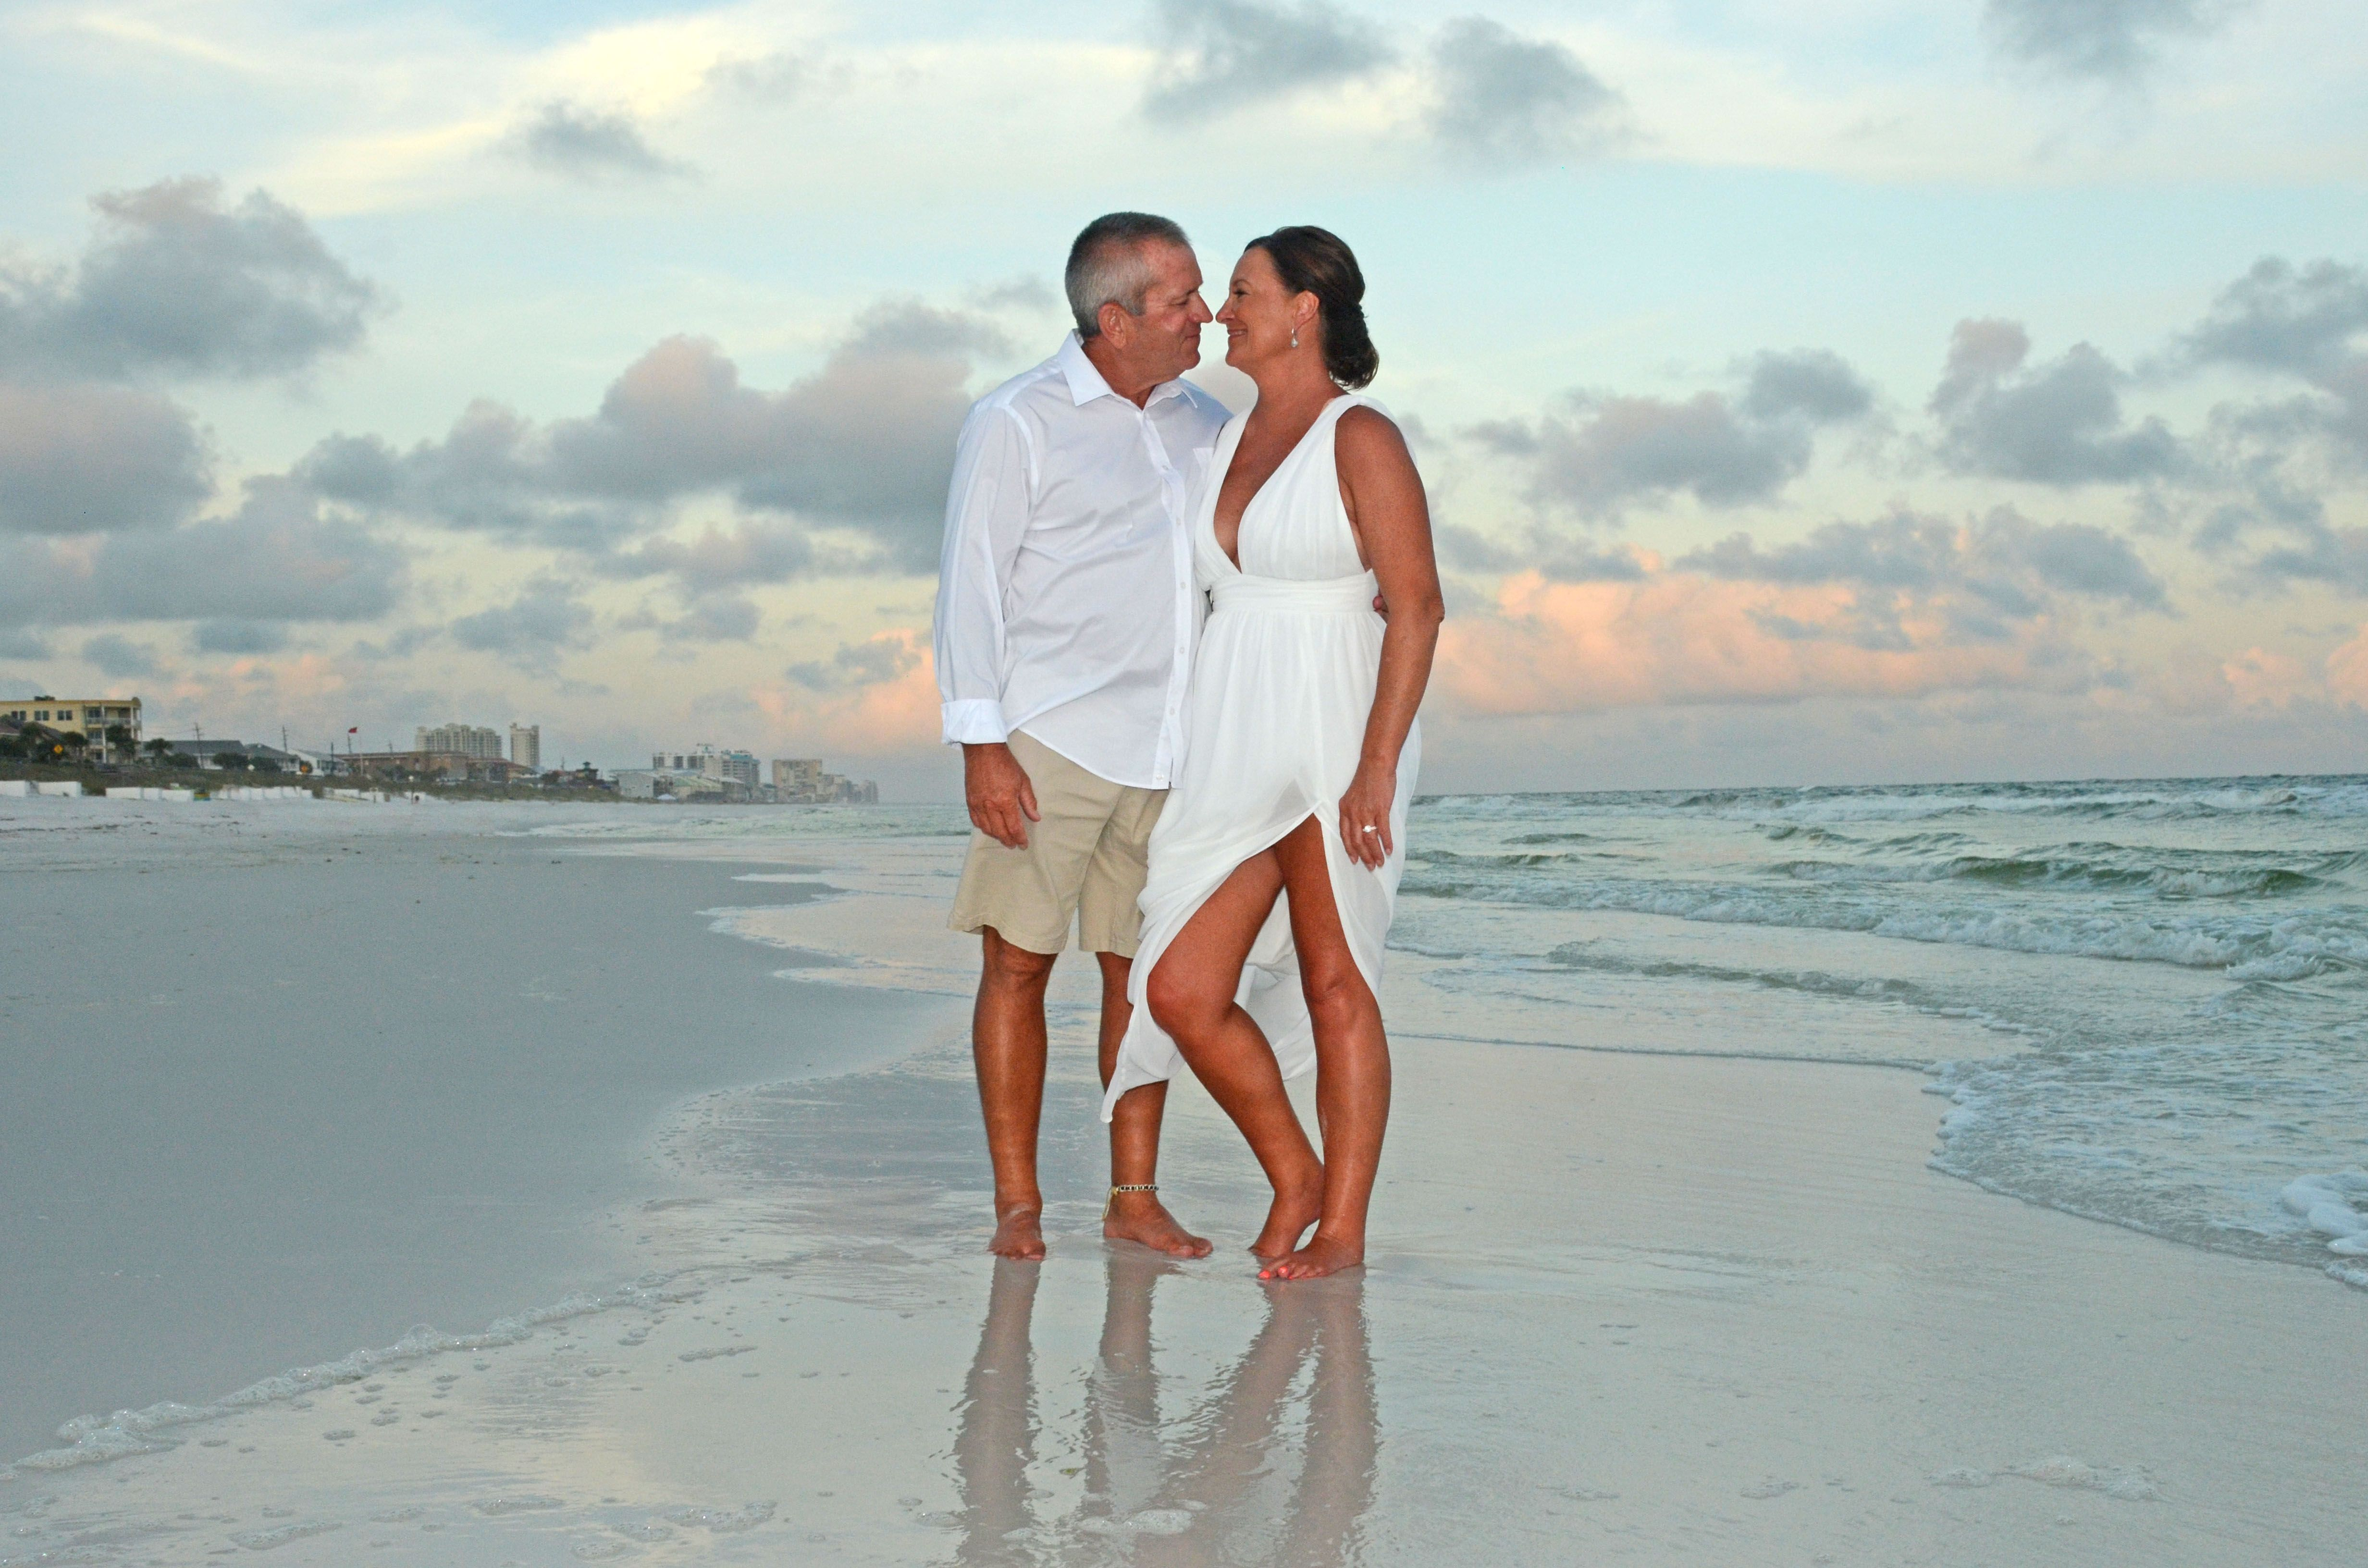 Florida Beach Wedding In 2020 Florida Beach Wedding Beach Destination Wedding Beach Wedding